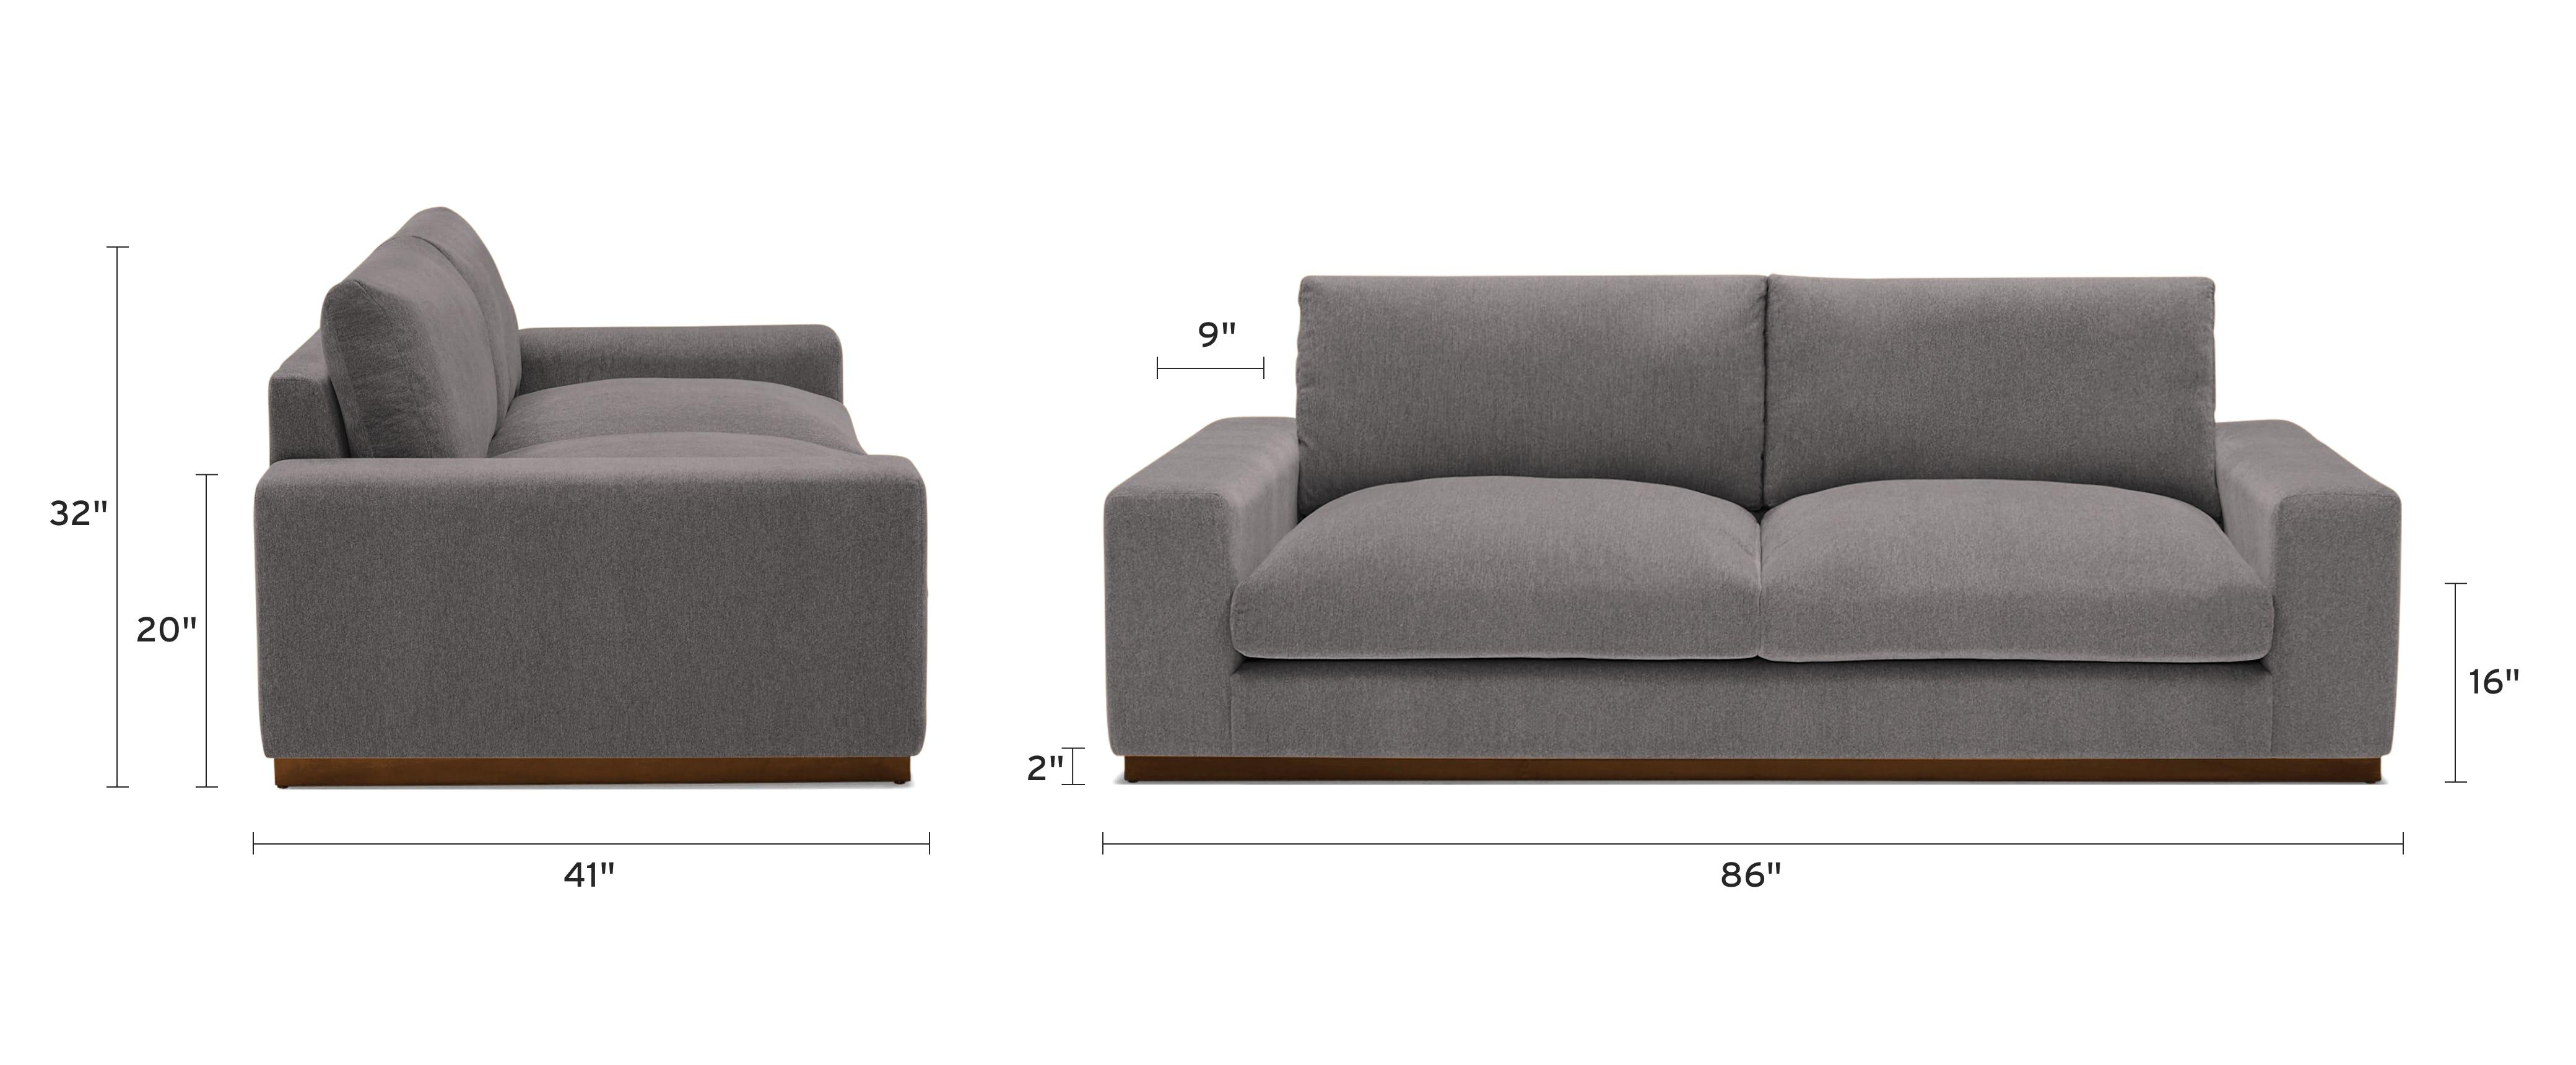 holt sofa dimensional image